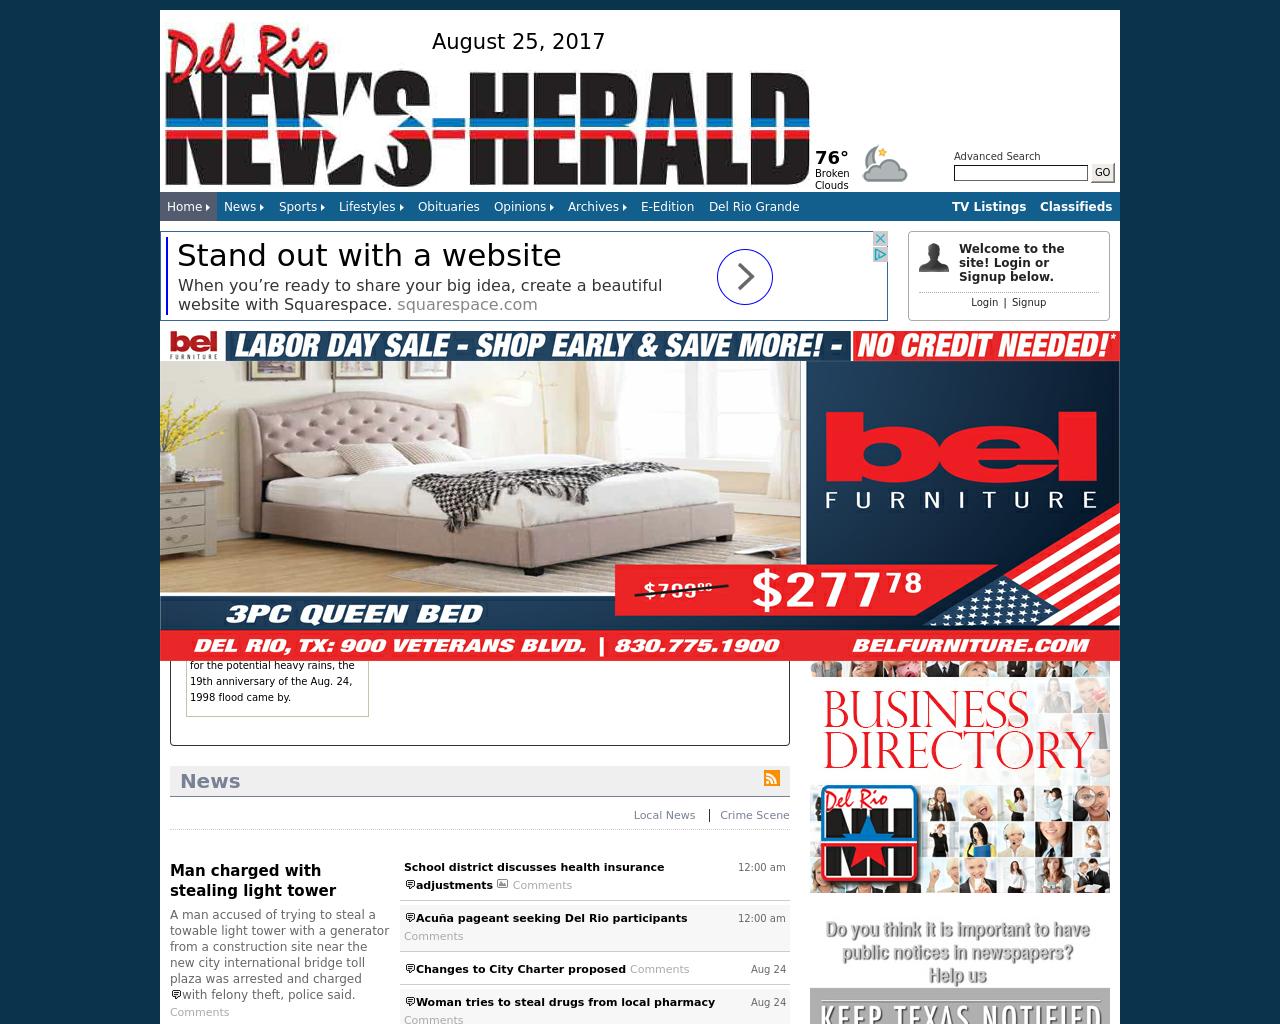 Del-Rio-News-Herald-Advertising-Reviews-Pricing